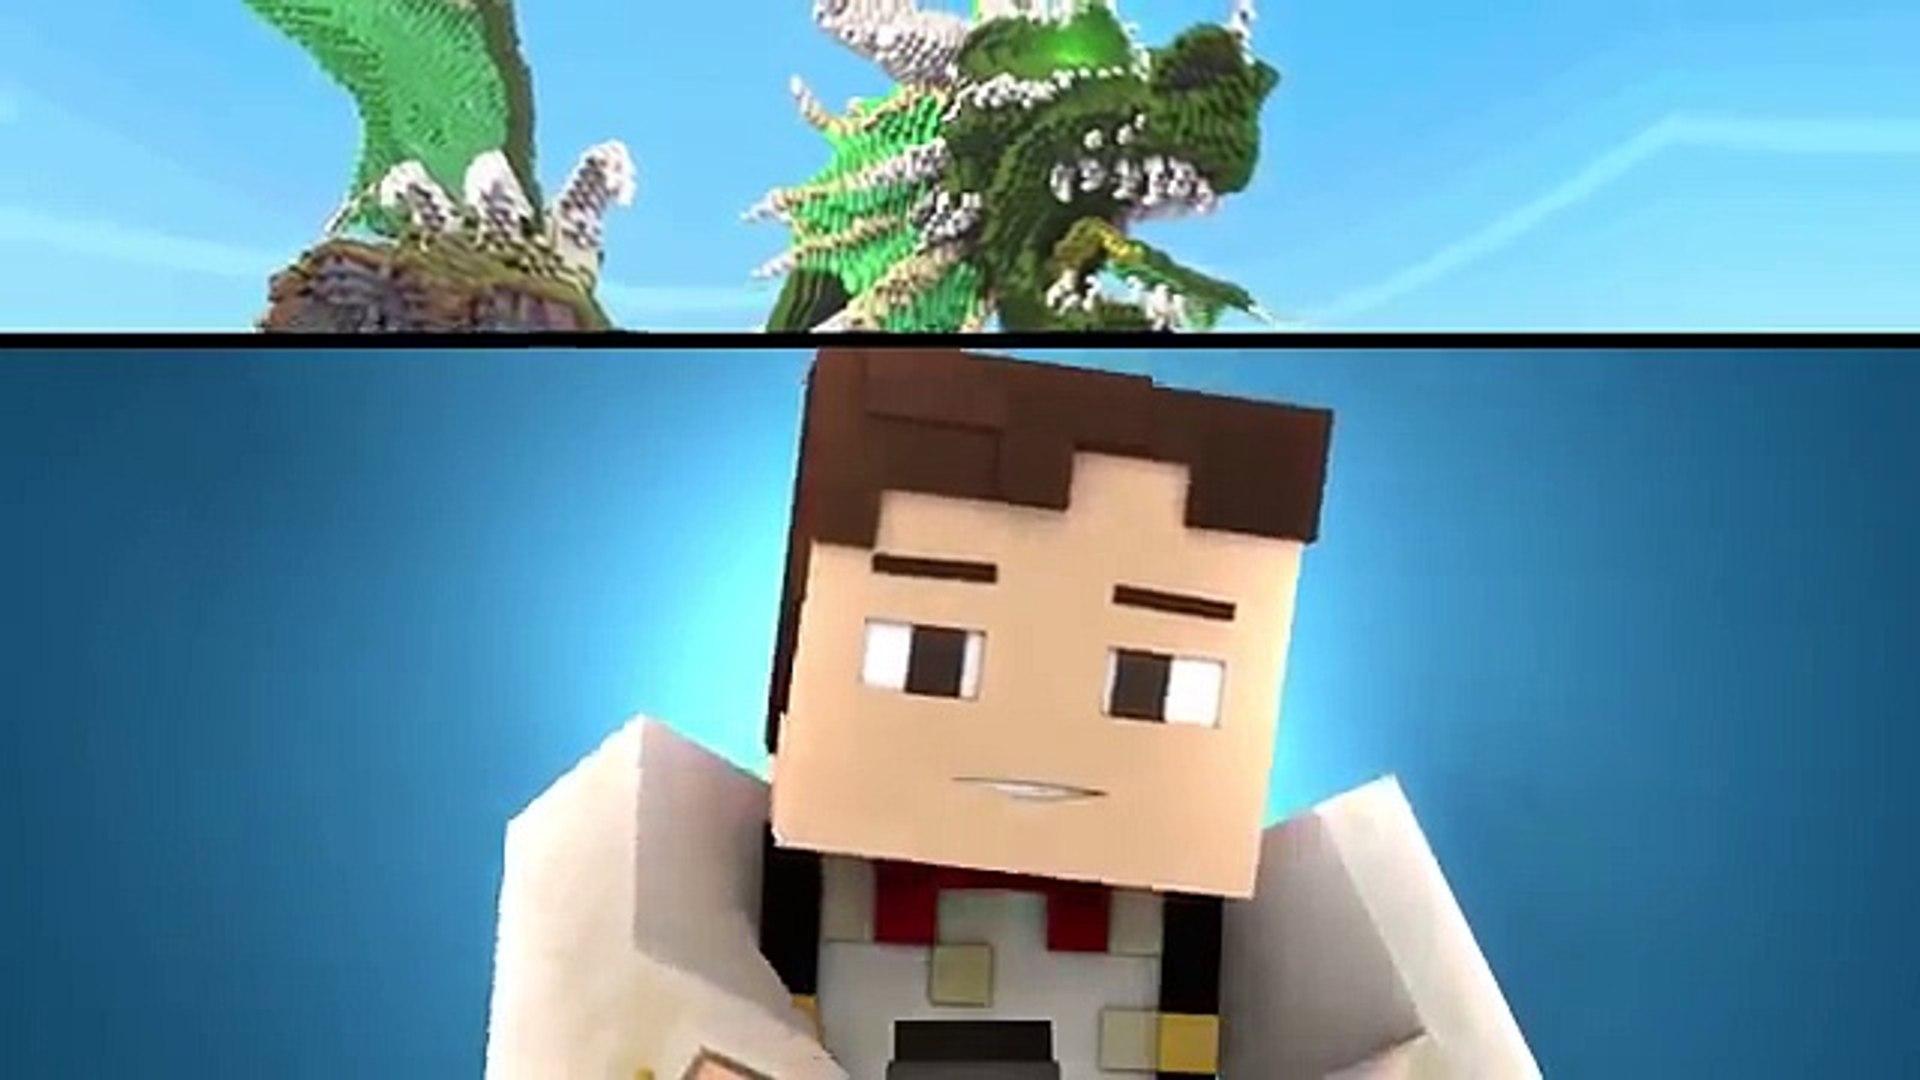 Minecraft Top 10 Songs - January 2015 Best Minecraft Songs Animations Parody Parodies 2015